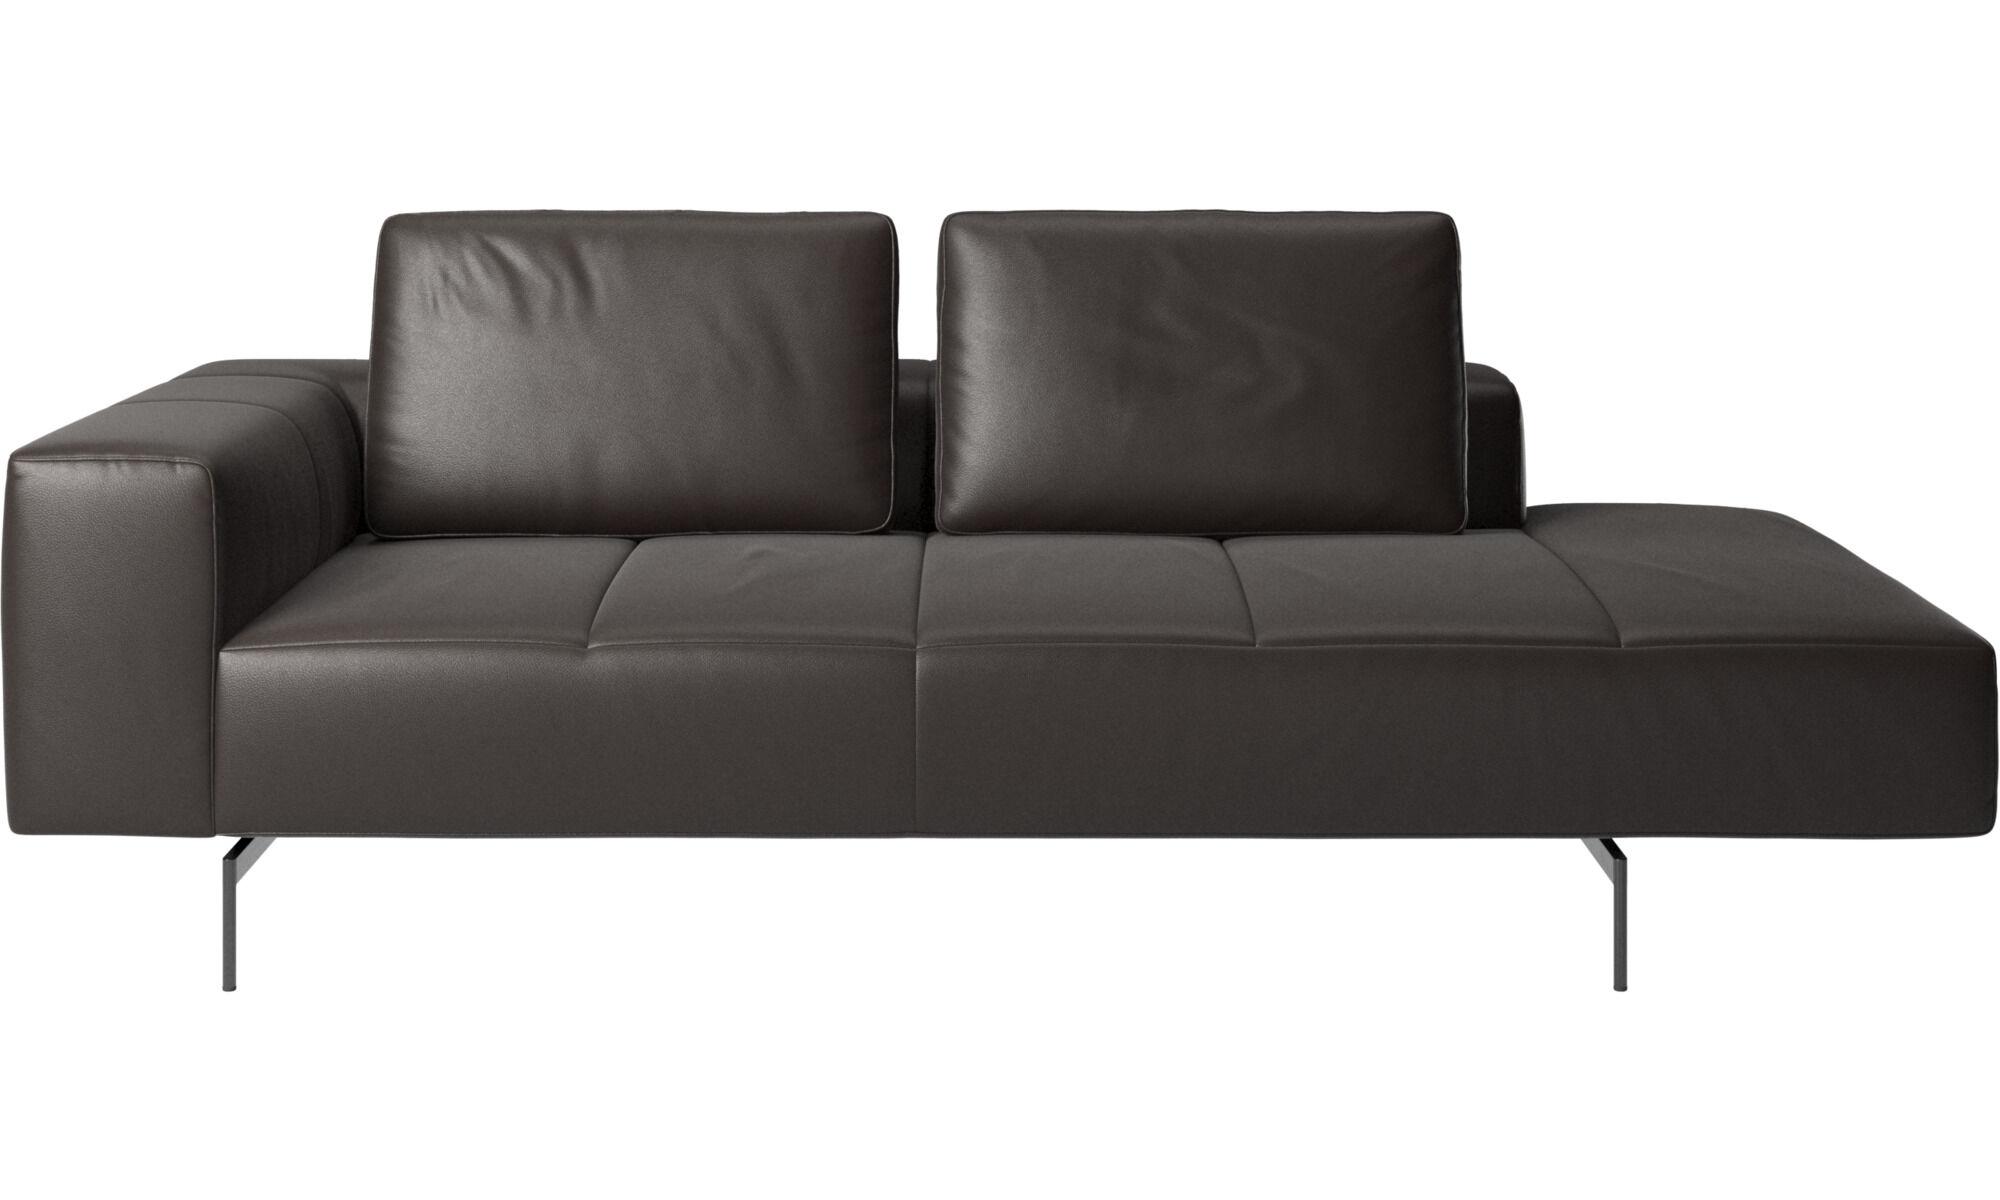 Sofa med sjeselong Marseille sofa med hvilemodul BoConcept